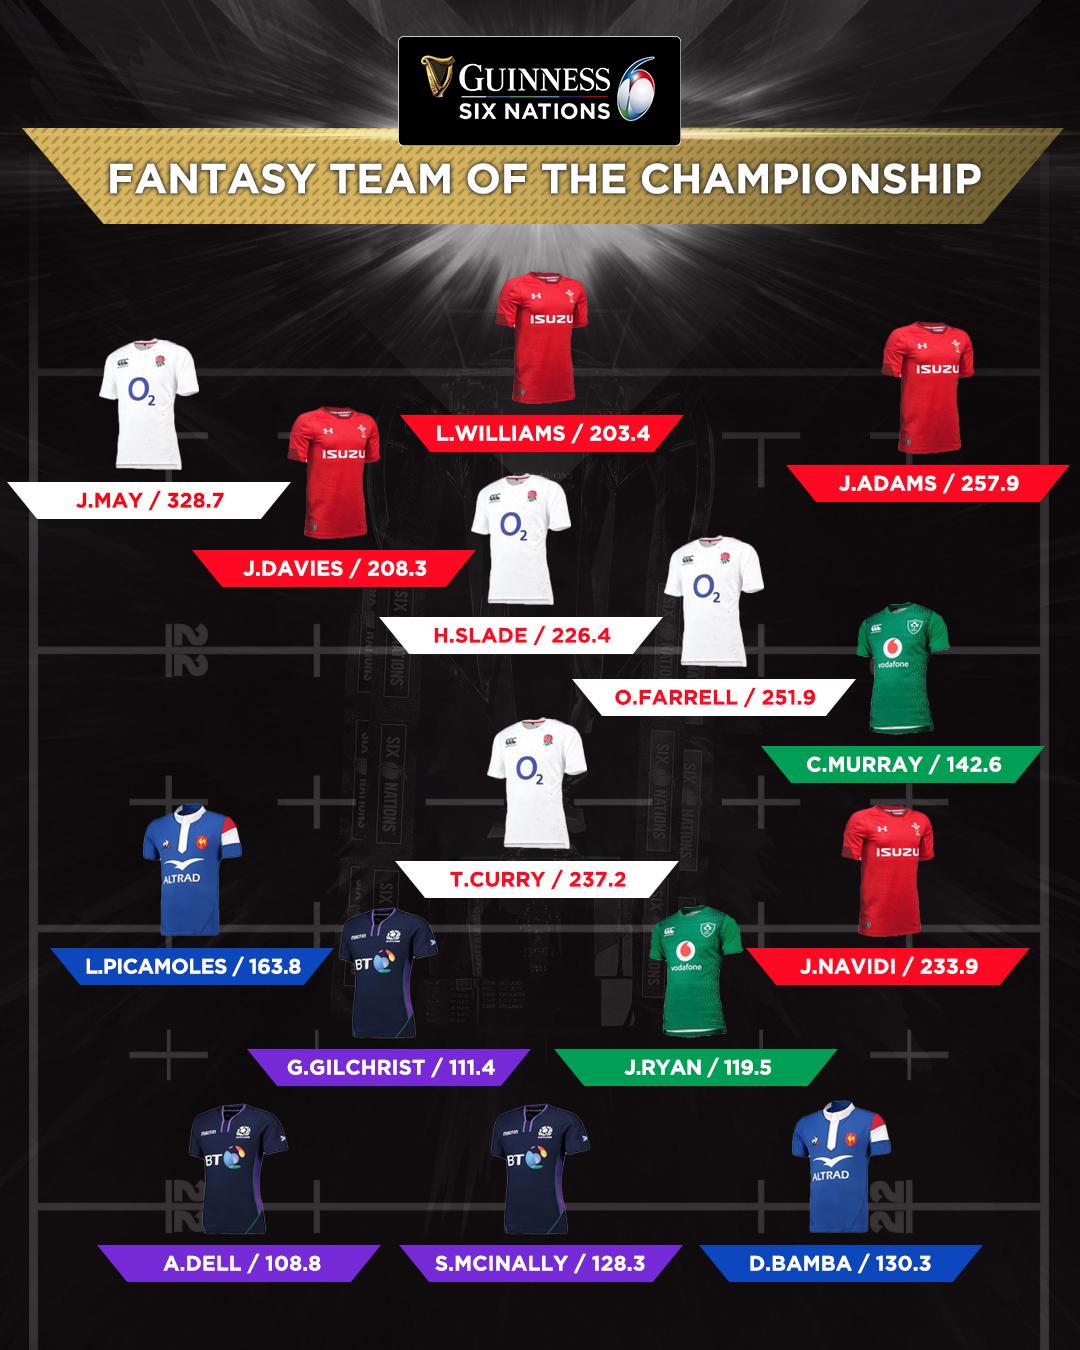 Team of the Championship